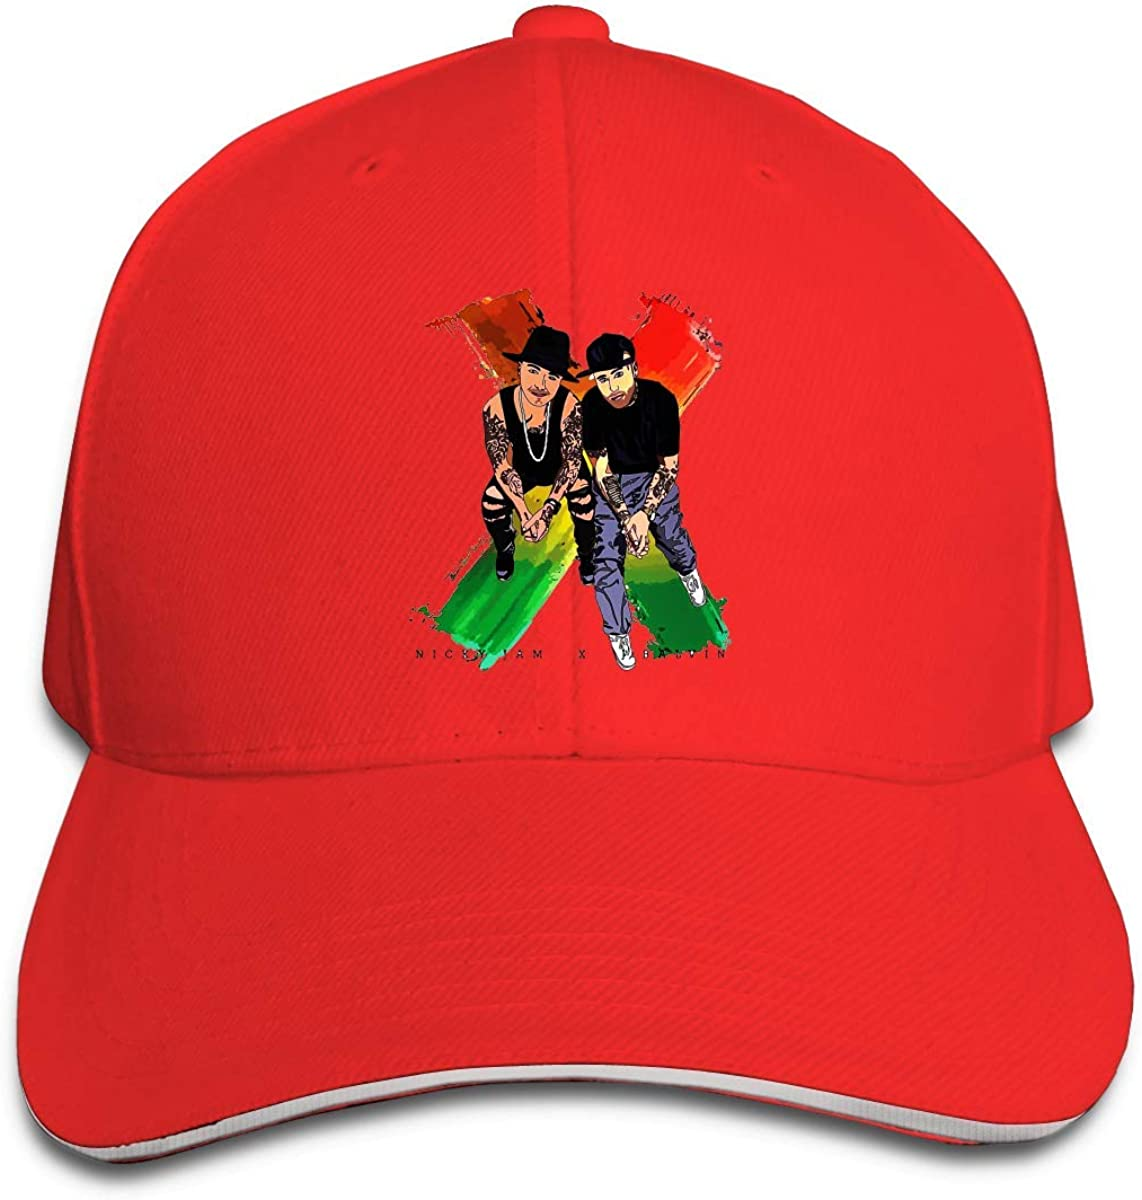 XSW Nicky Jam X J-Balvin Unisex Flat Bill Gorras de Béisbol ...